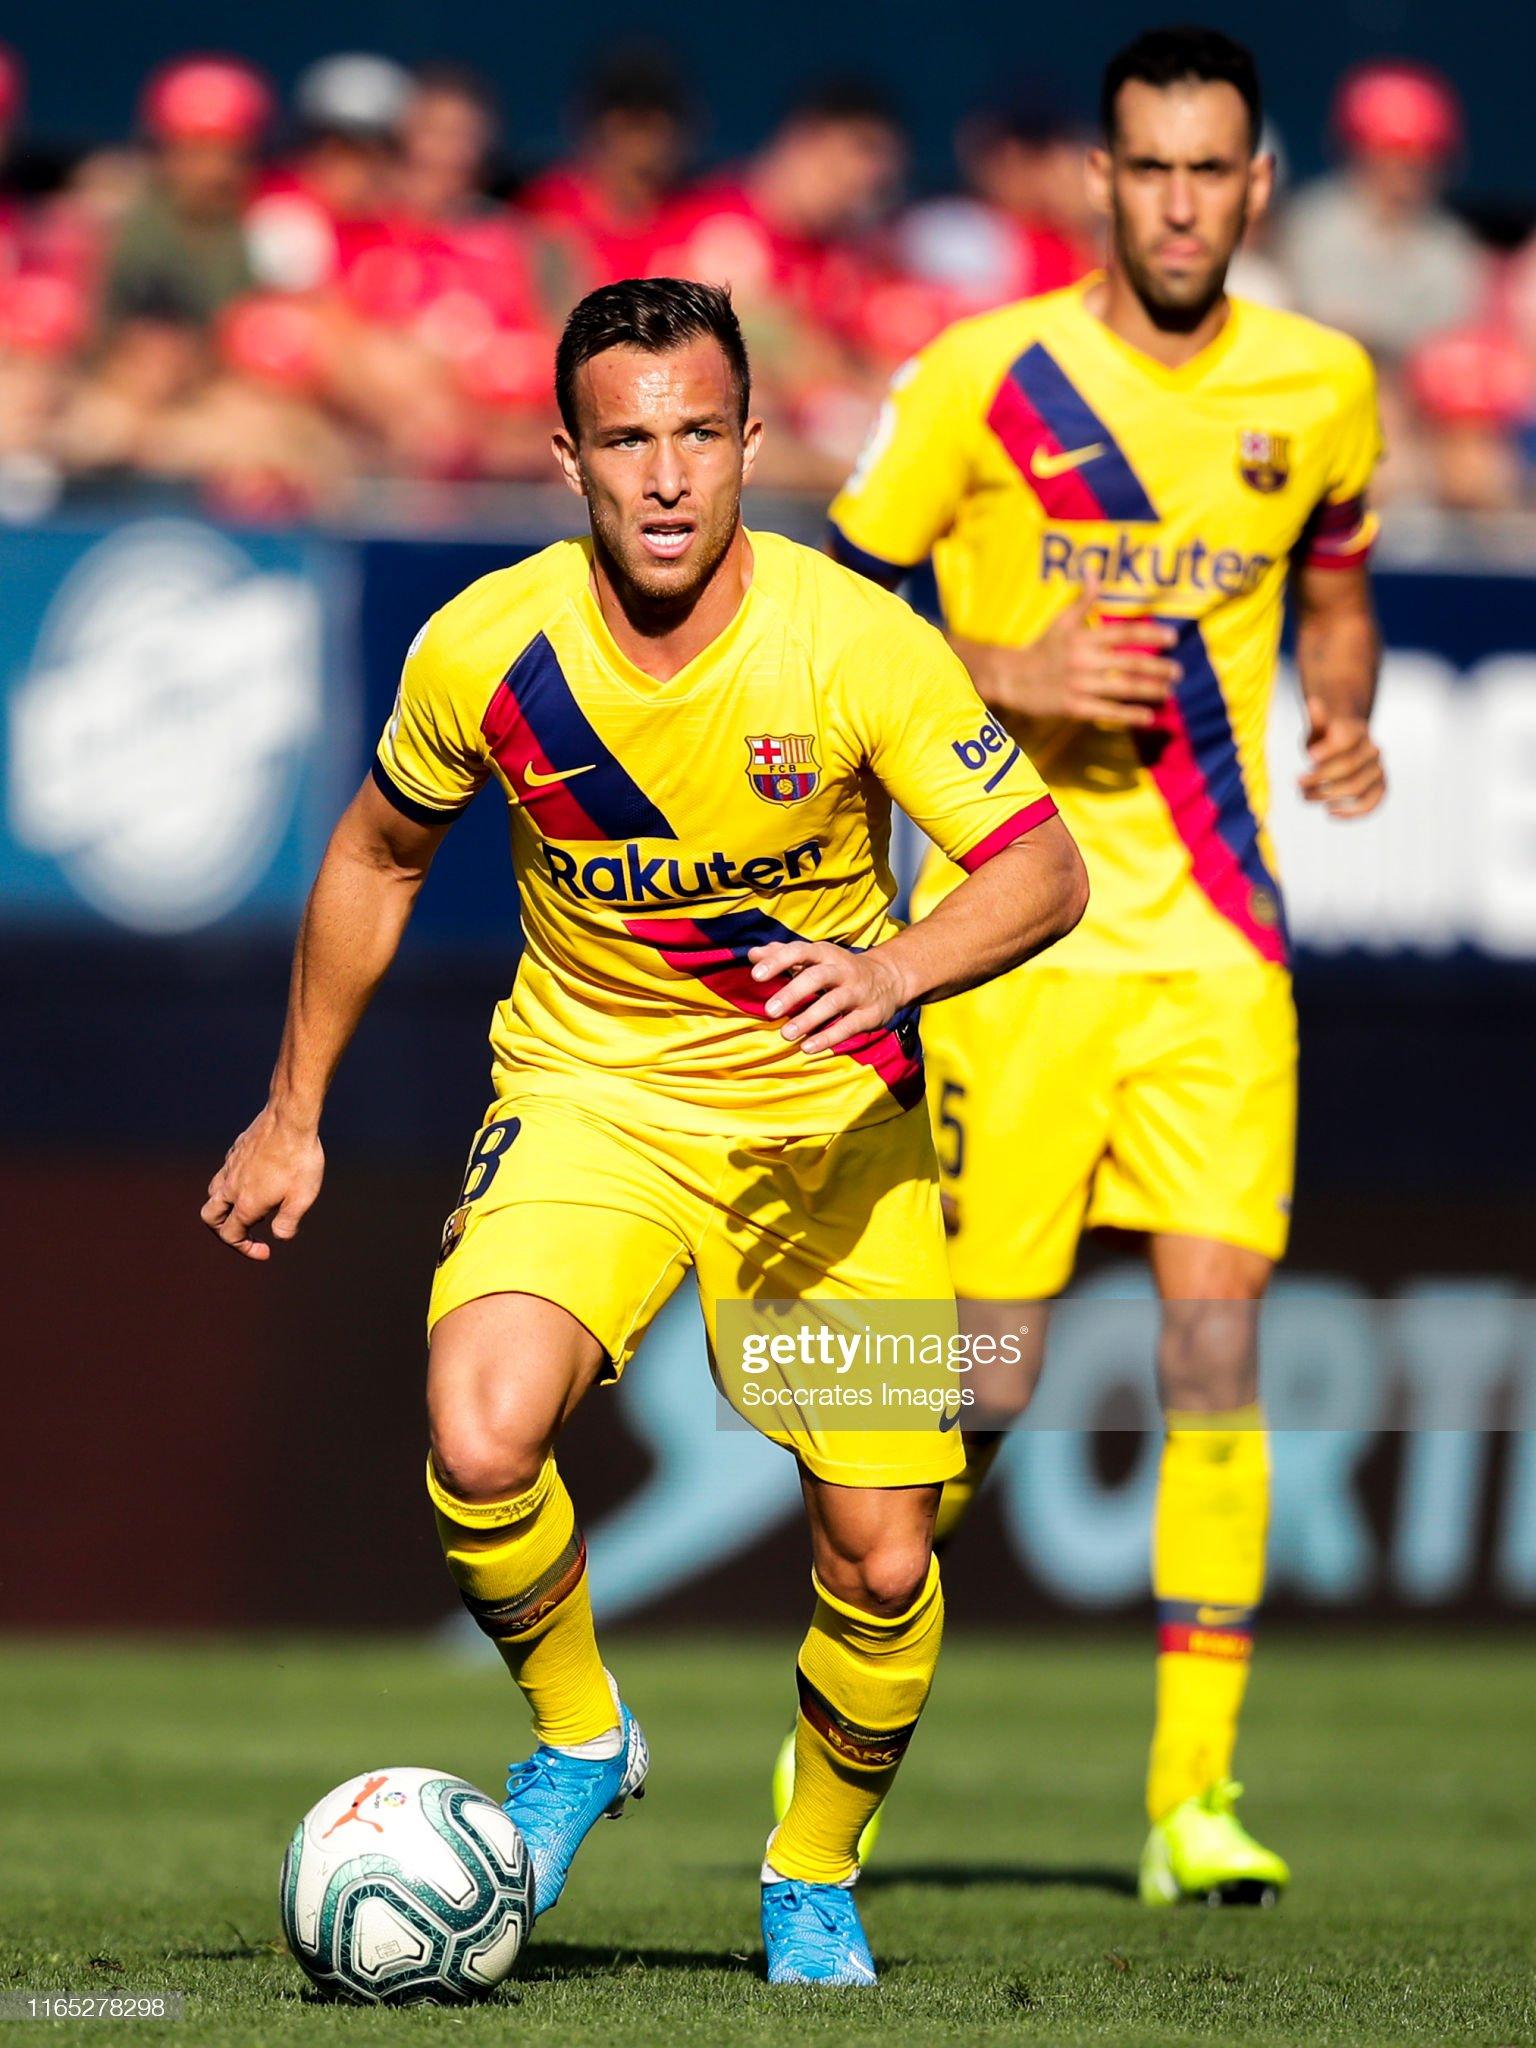 صور مباراة : أوساسونا - برشلونة 2-2 ( 31-08-2019 )  Arthur-of-fc-barcelona-during-the-la-liga-santander-match-between-v-picture-id1165278298?s=2048x2048